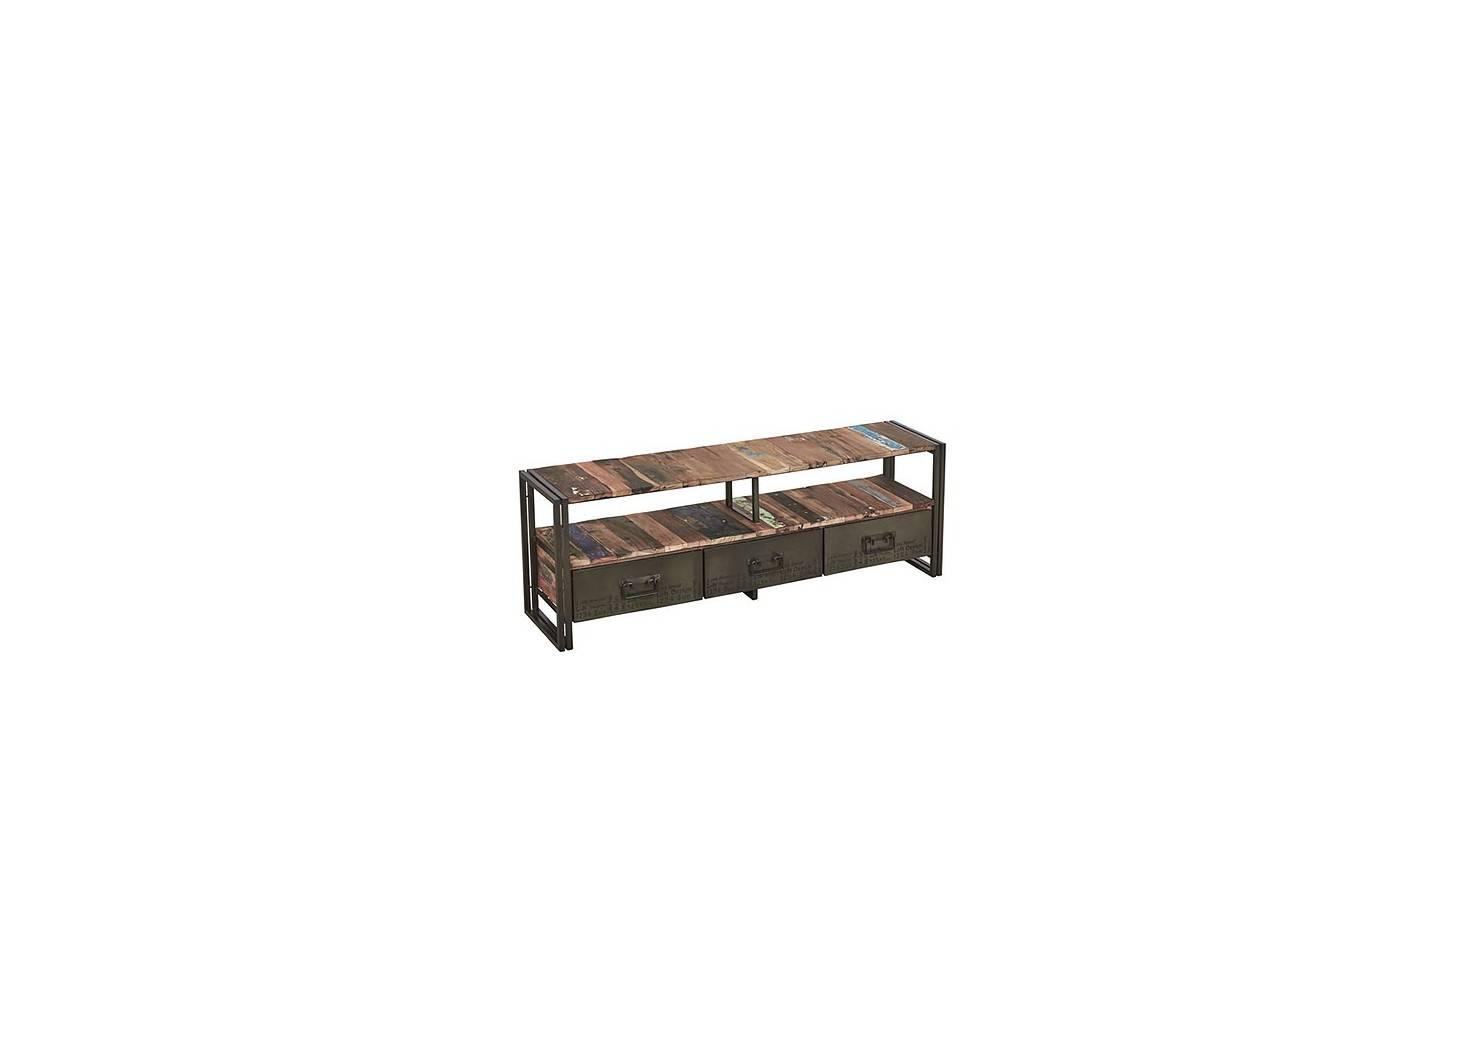 Meuble TV industriel Edito - 3 tiroirs